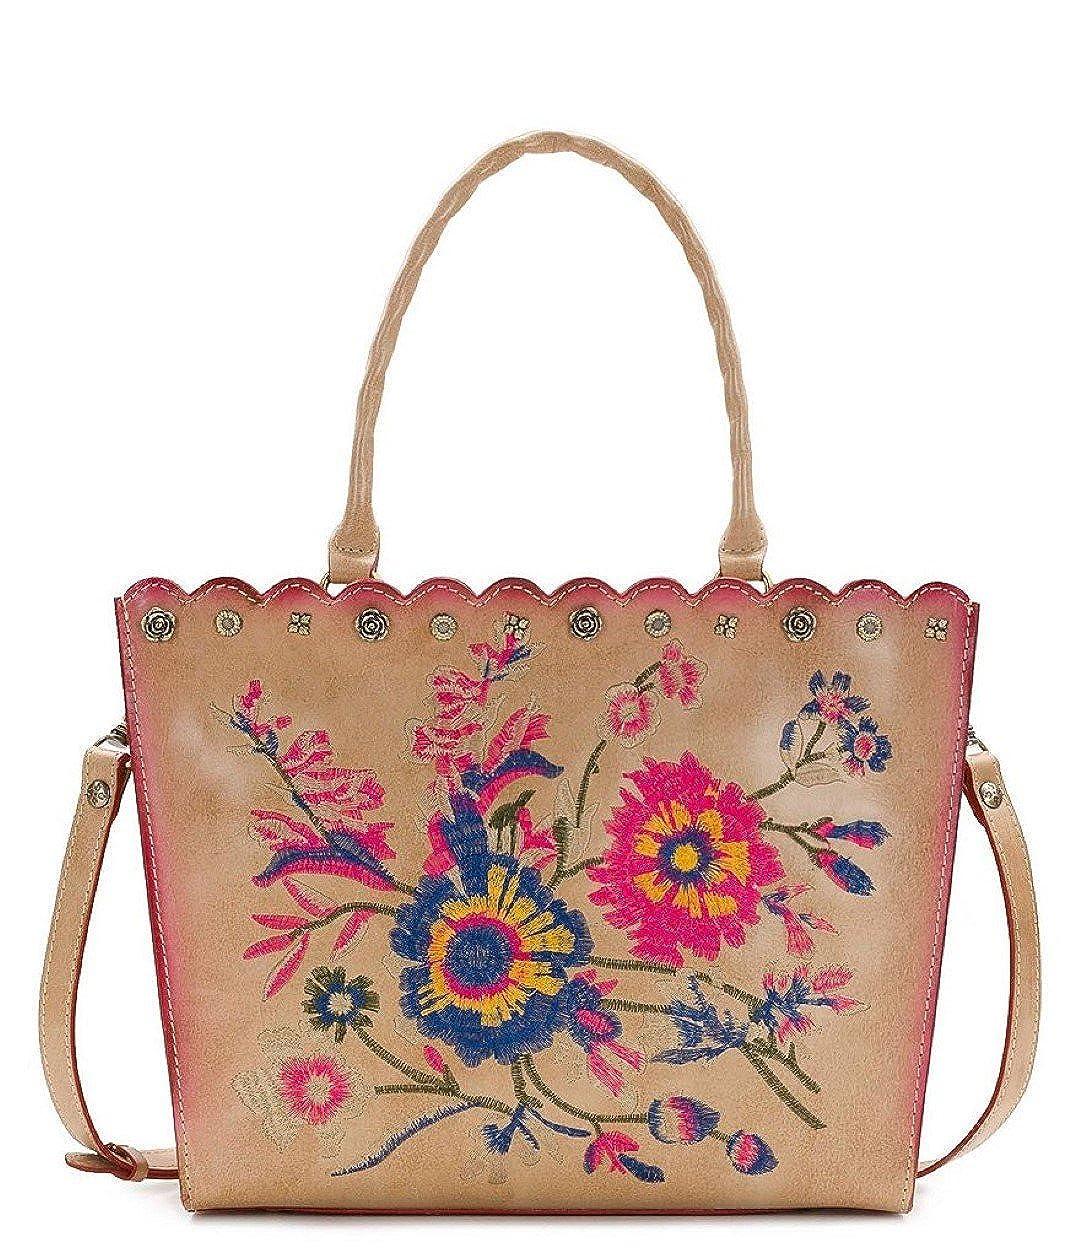 5926dcbe38eb67 Amazon.com: Patricia Nash Zancona Sand Embroidered Leather Tote: Shoes